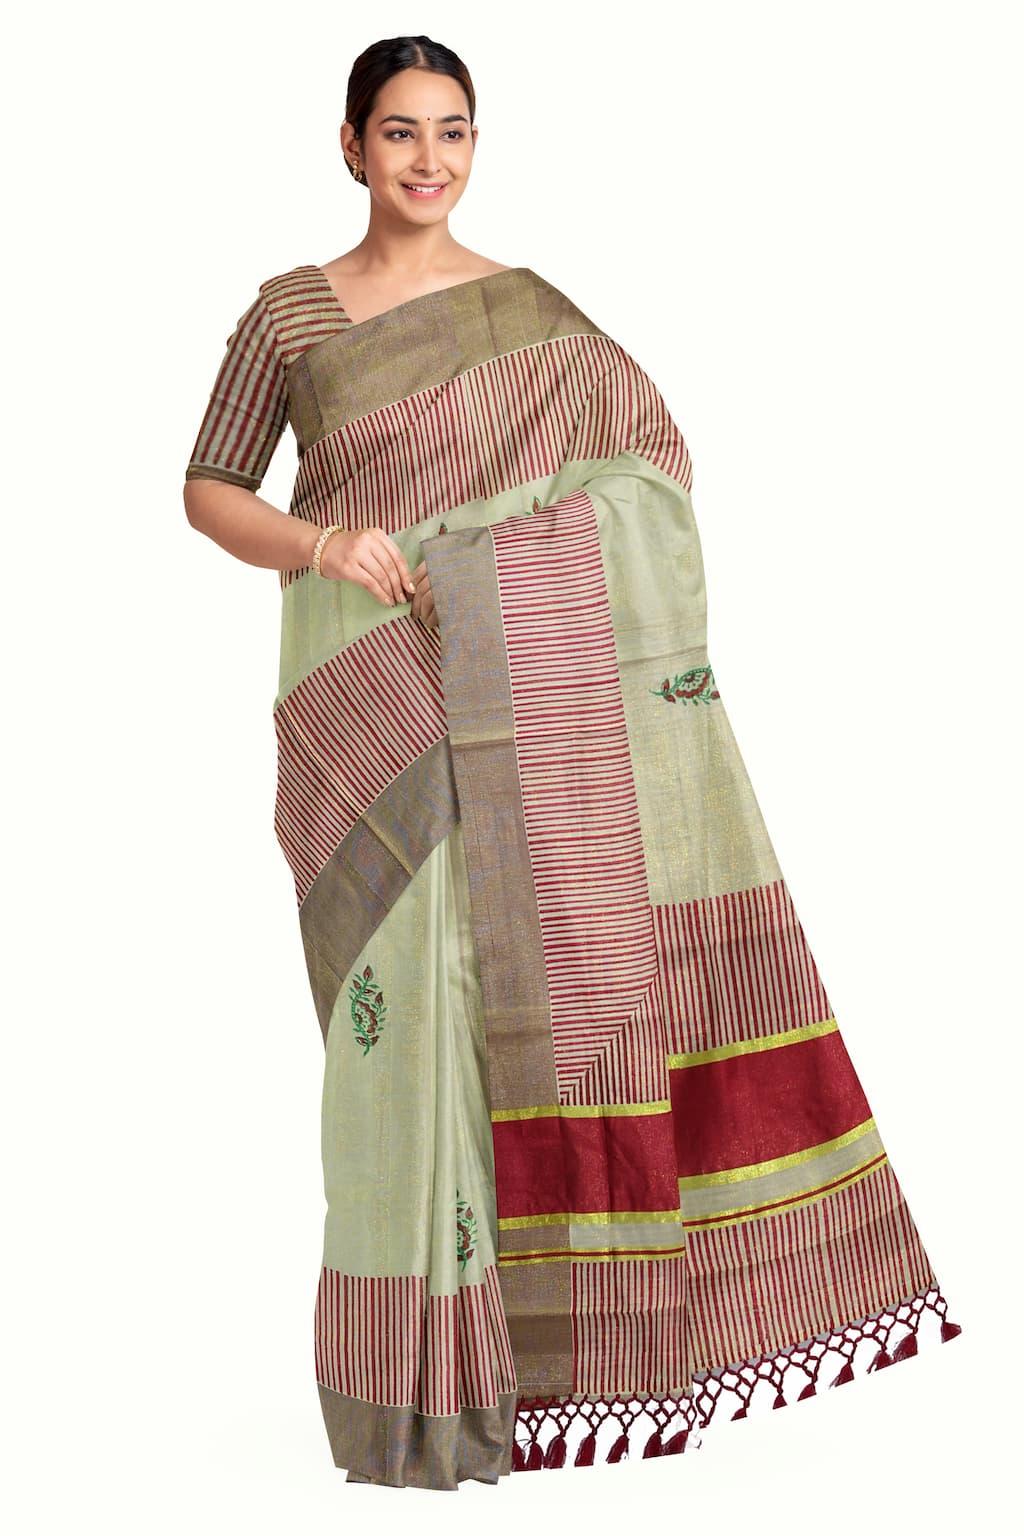 Kerala Kasavu Tissue Saree With Block Print Stripes